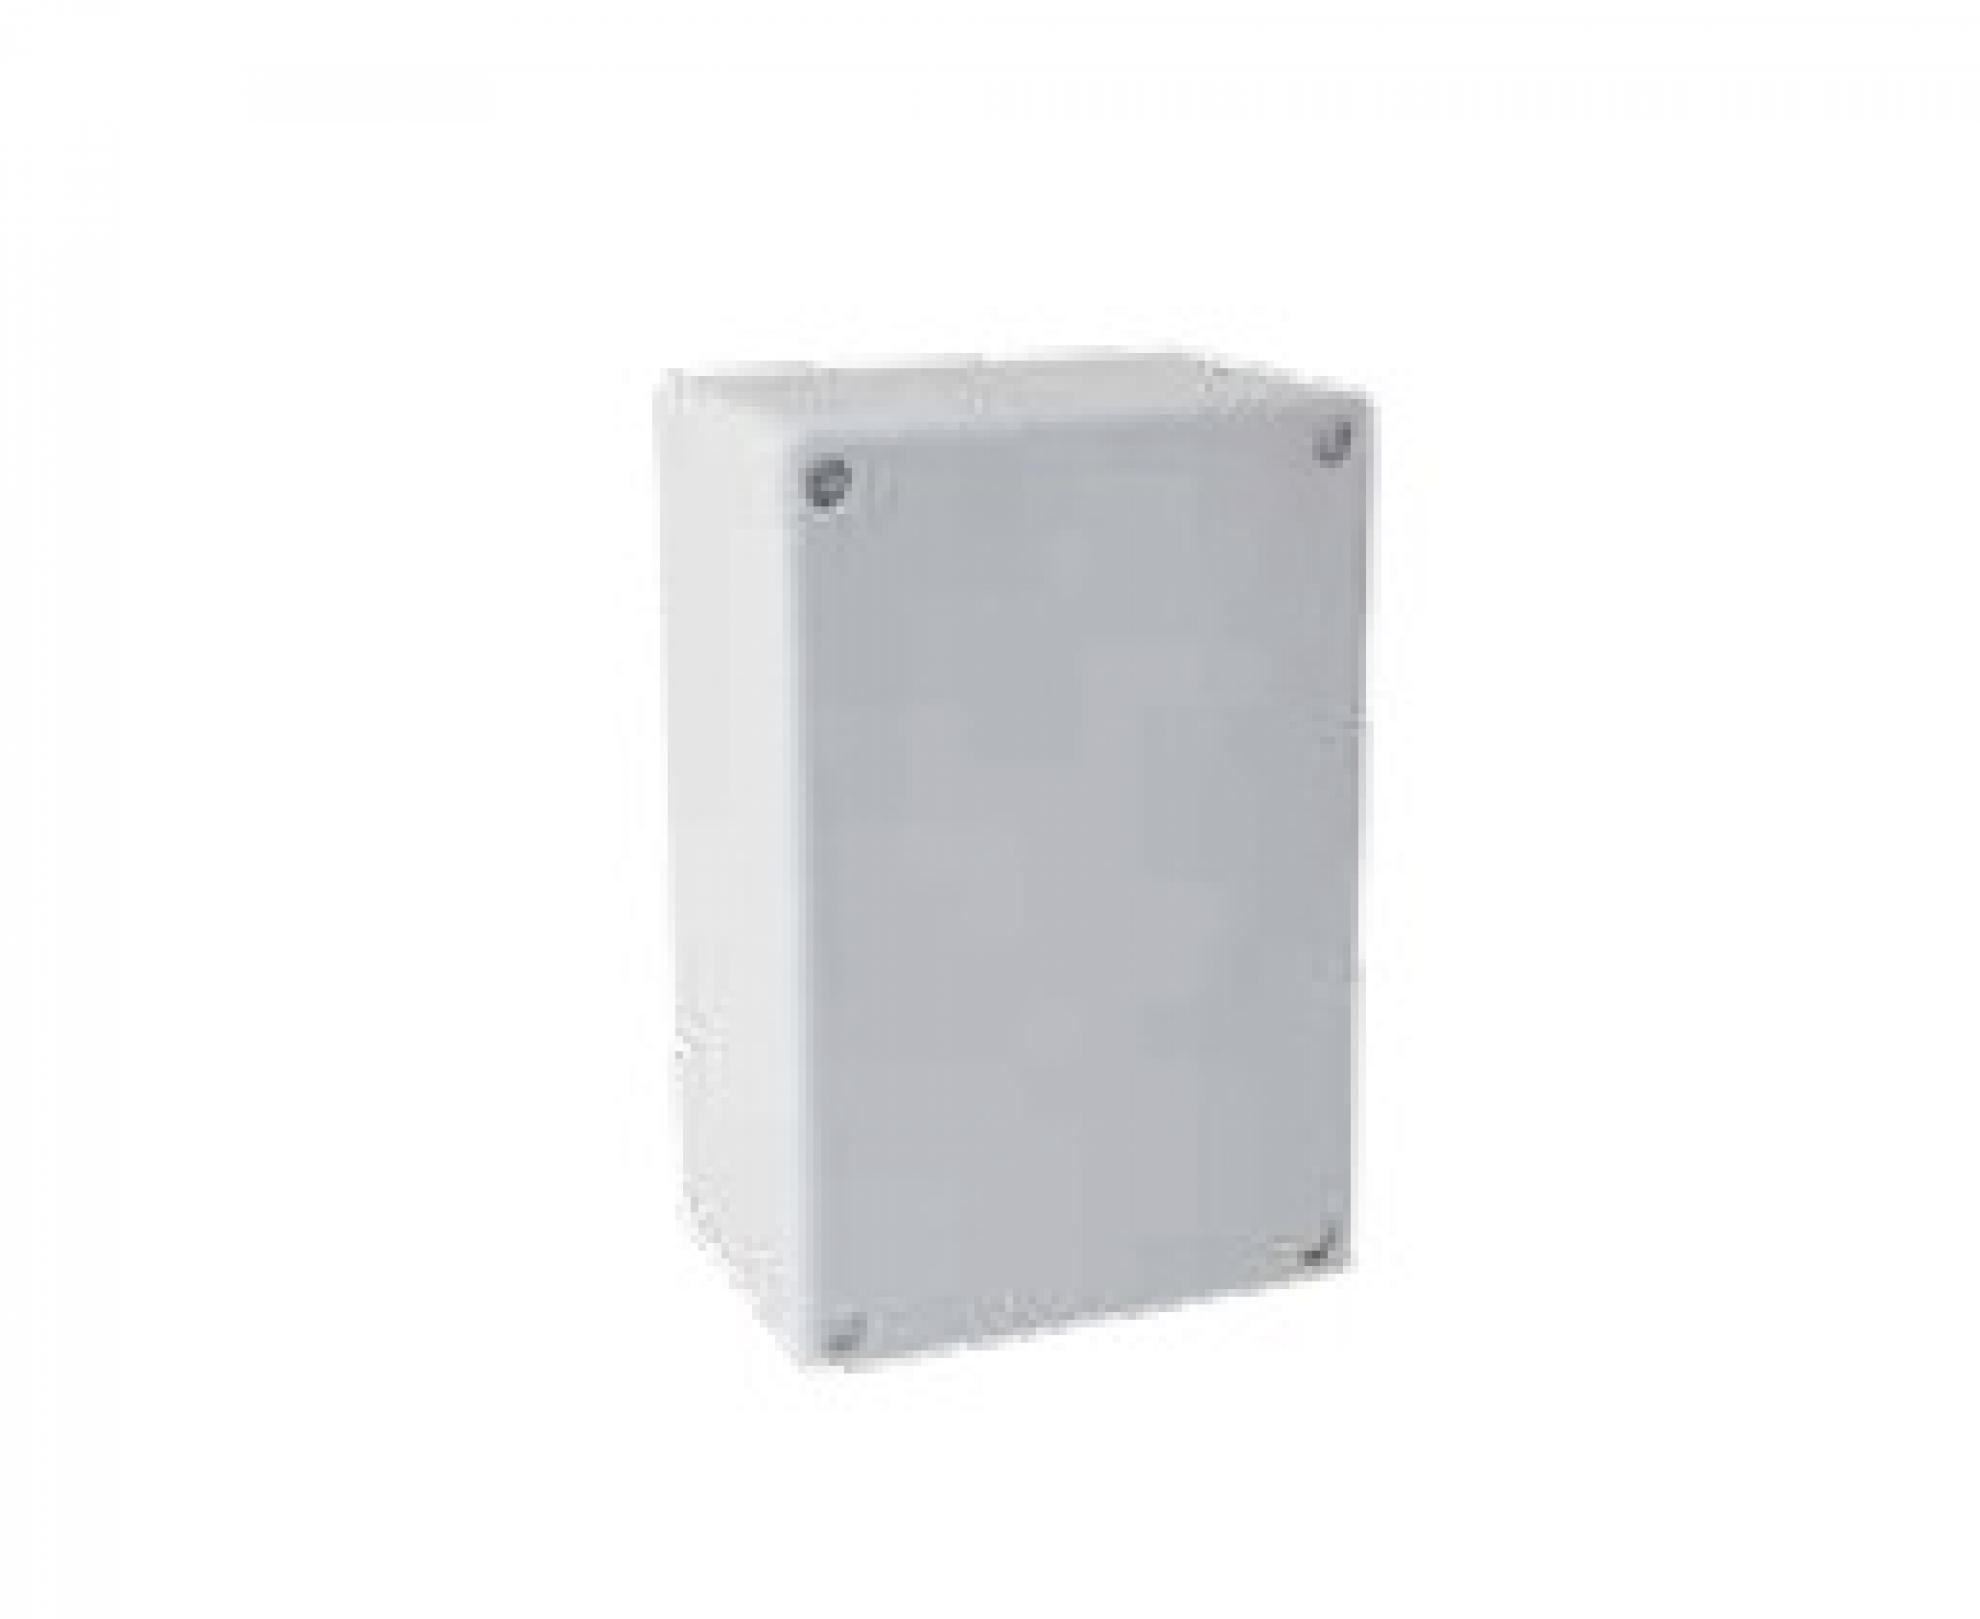 Caixa plastica nylon - 126x86 67MM